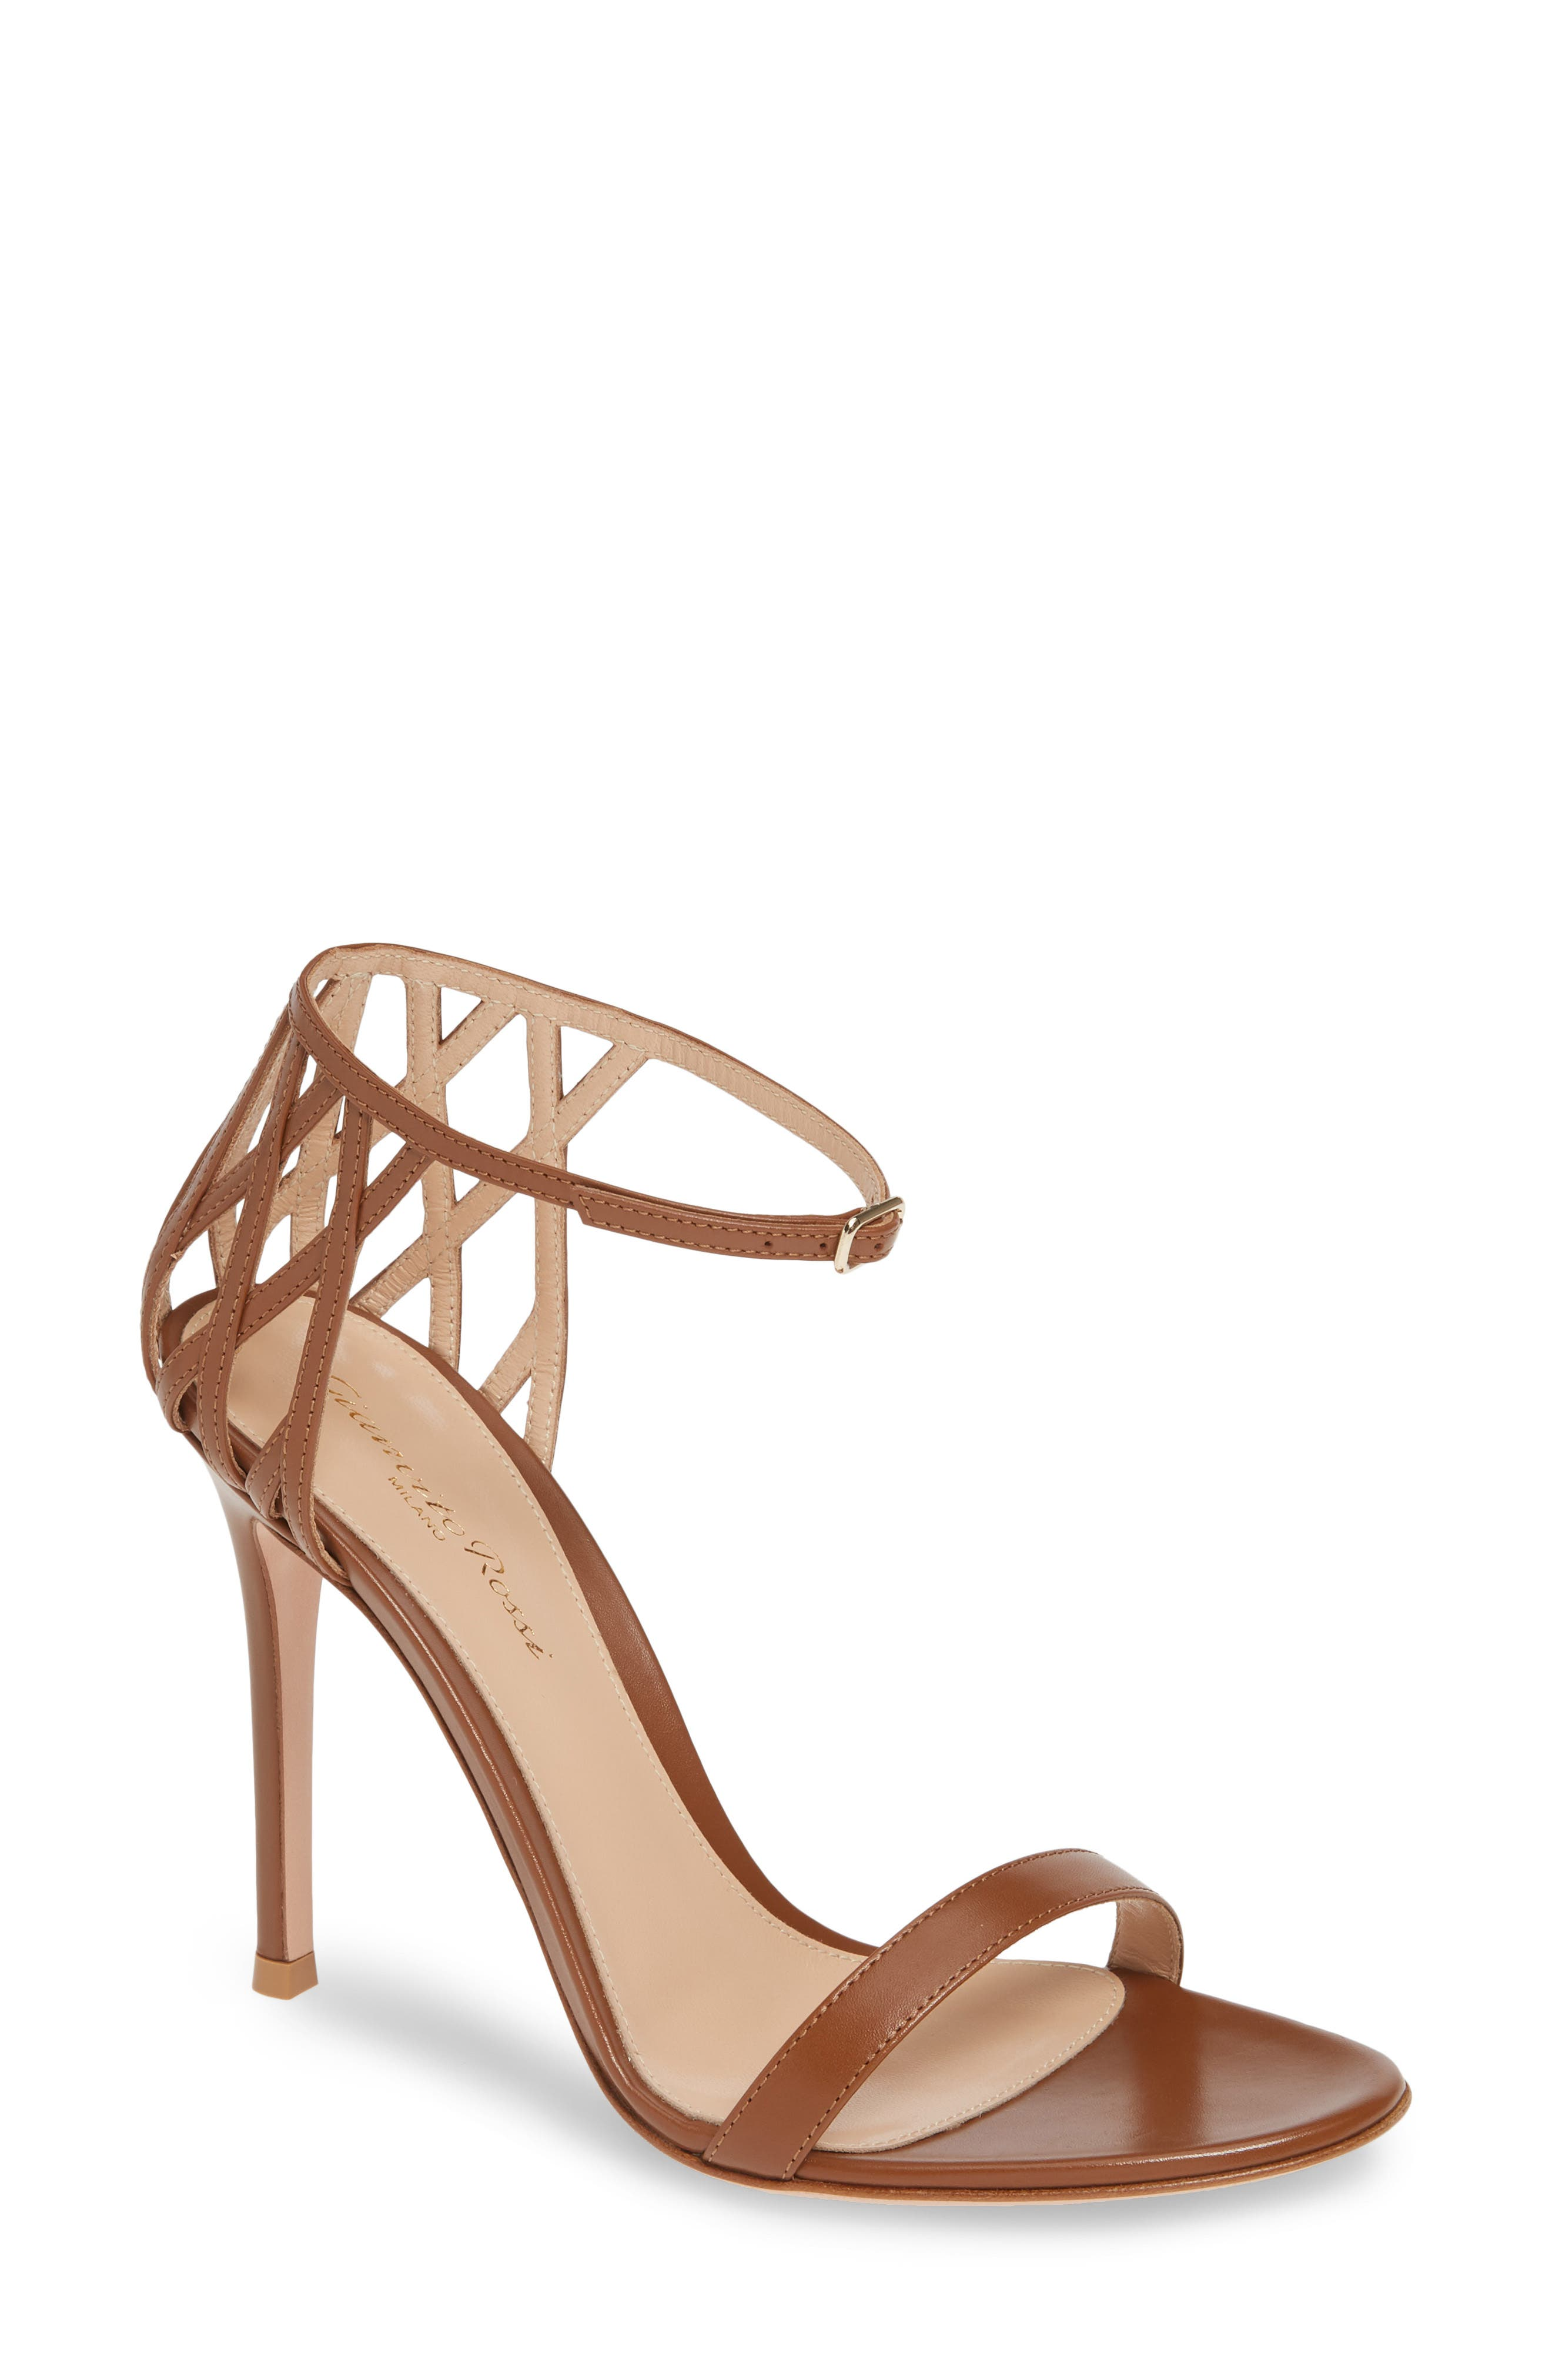 Gianvito Rossi Weave Ankle Strap Sandal, Brown